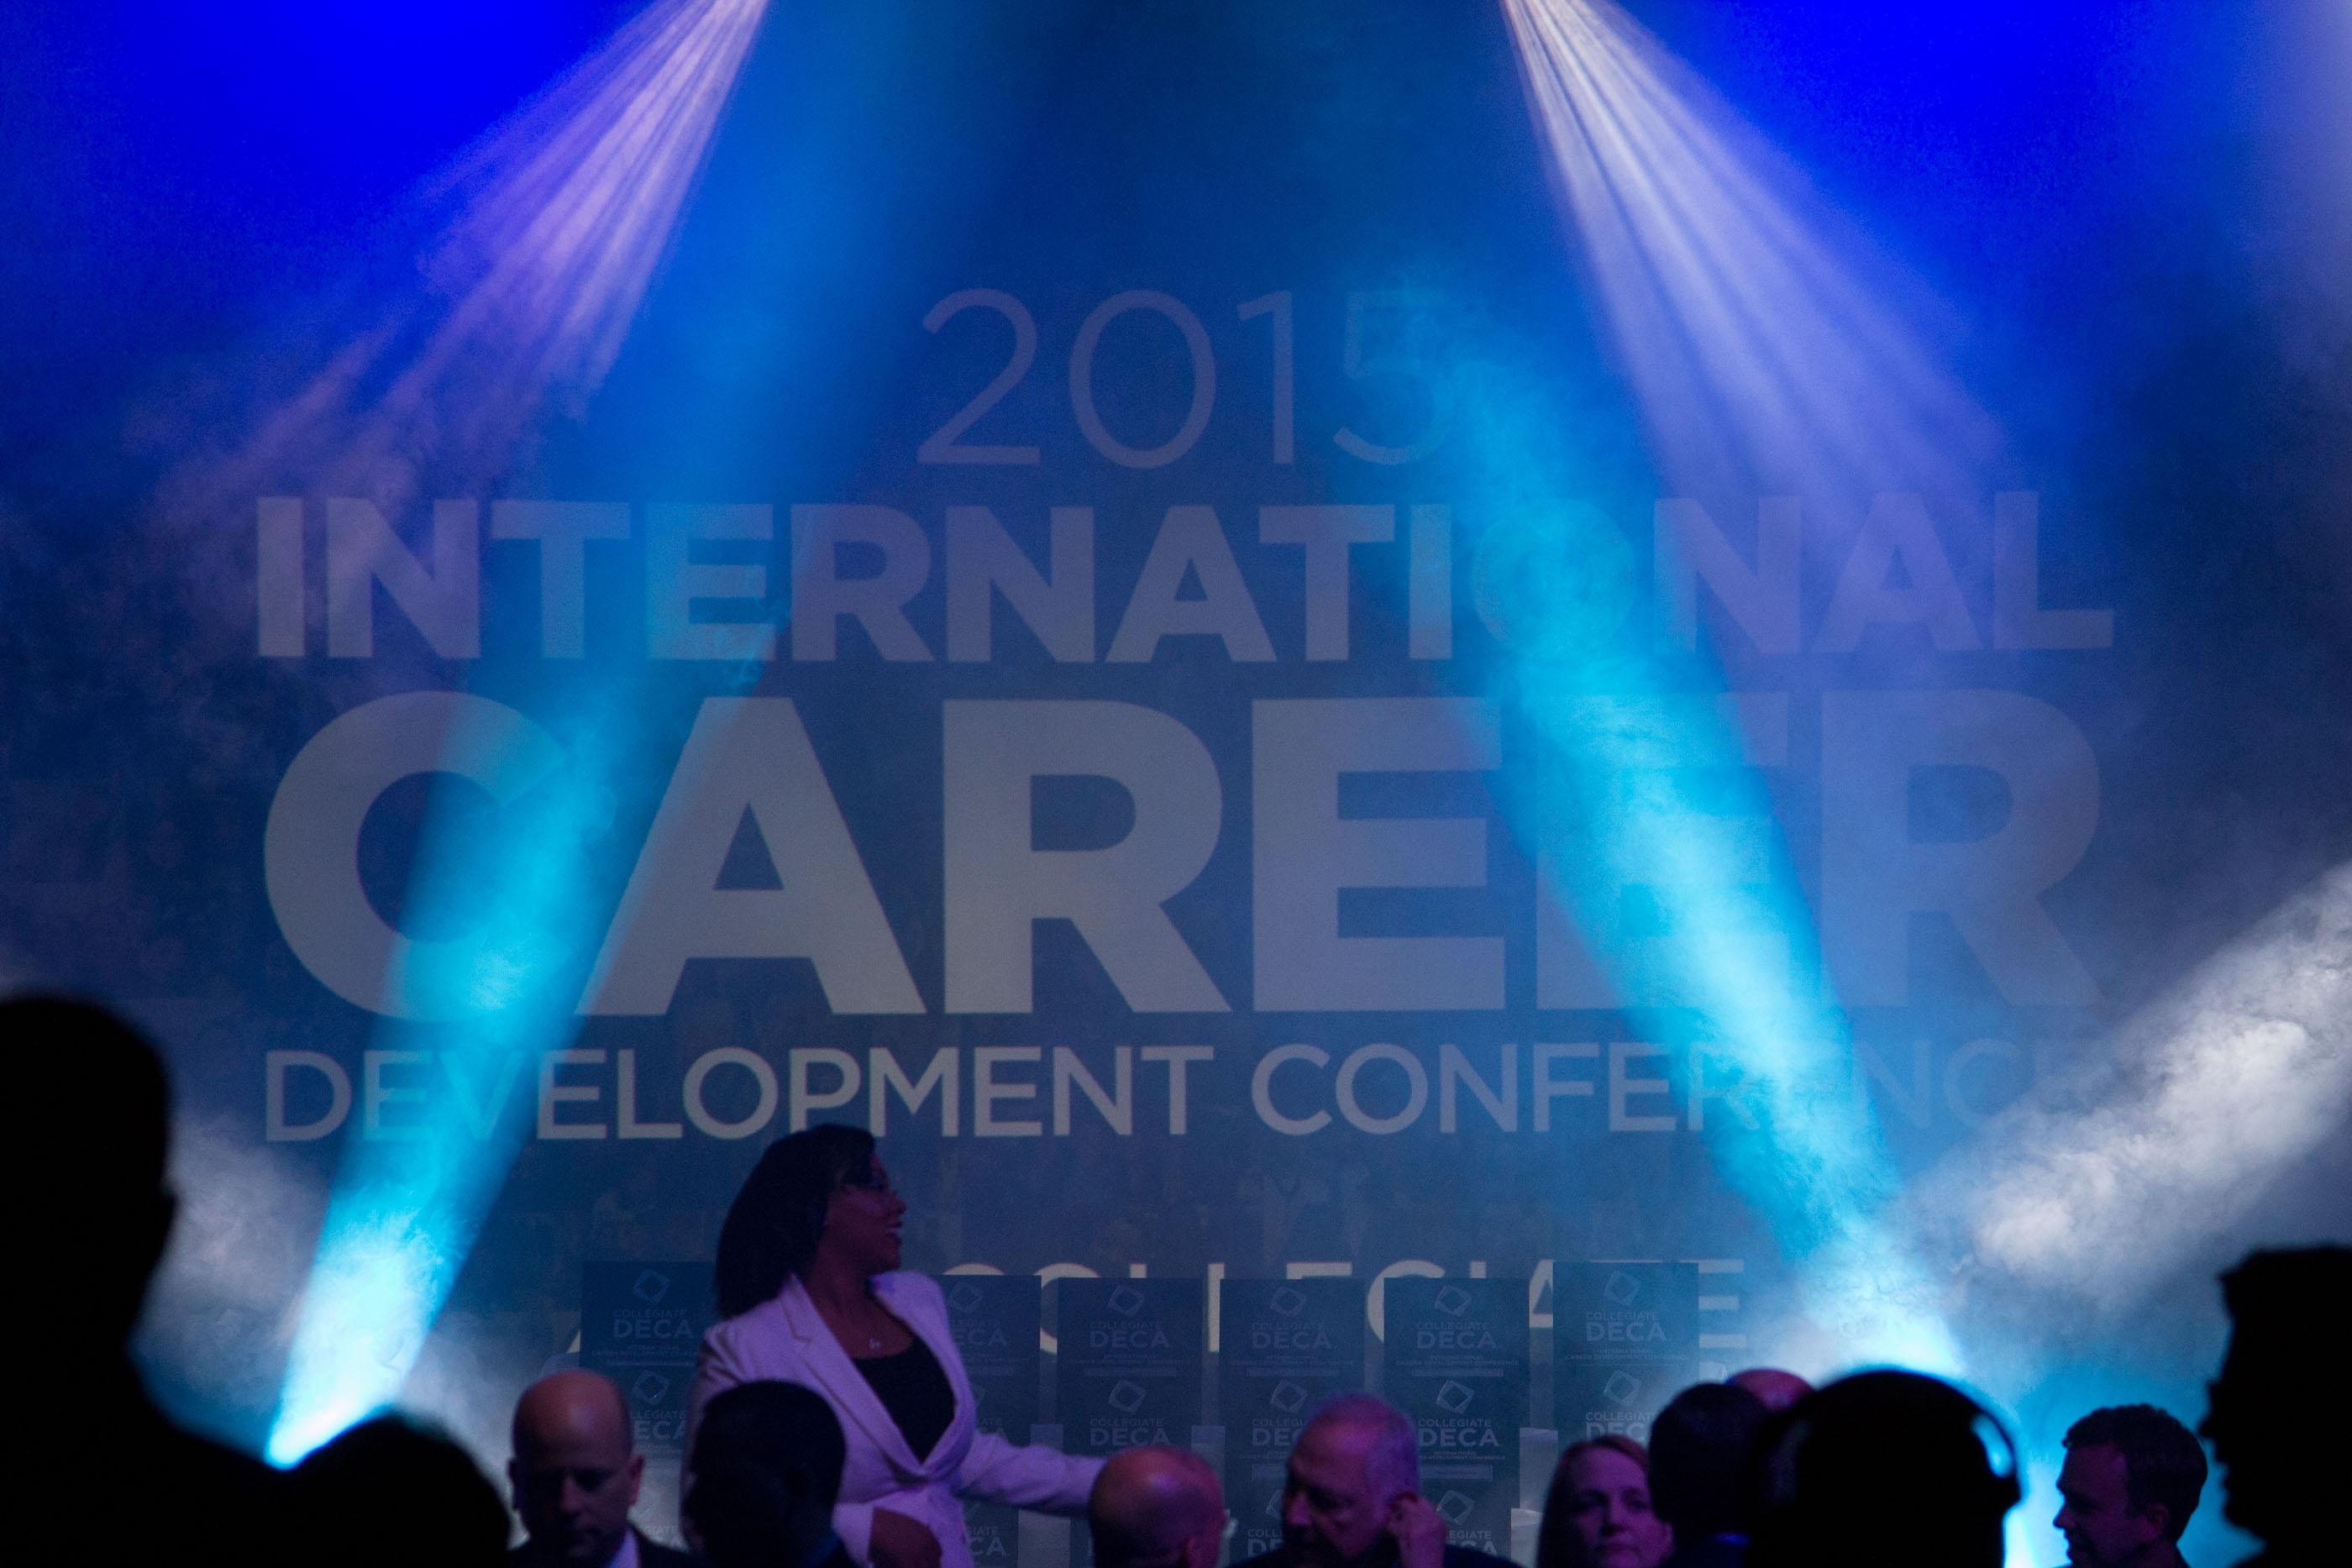 Bellevue DECA at the Collegiate DECA 2015 International Career Development Conference